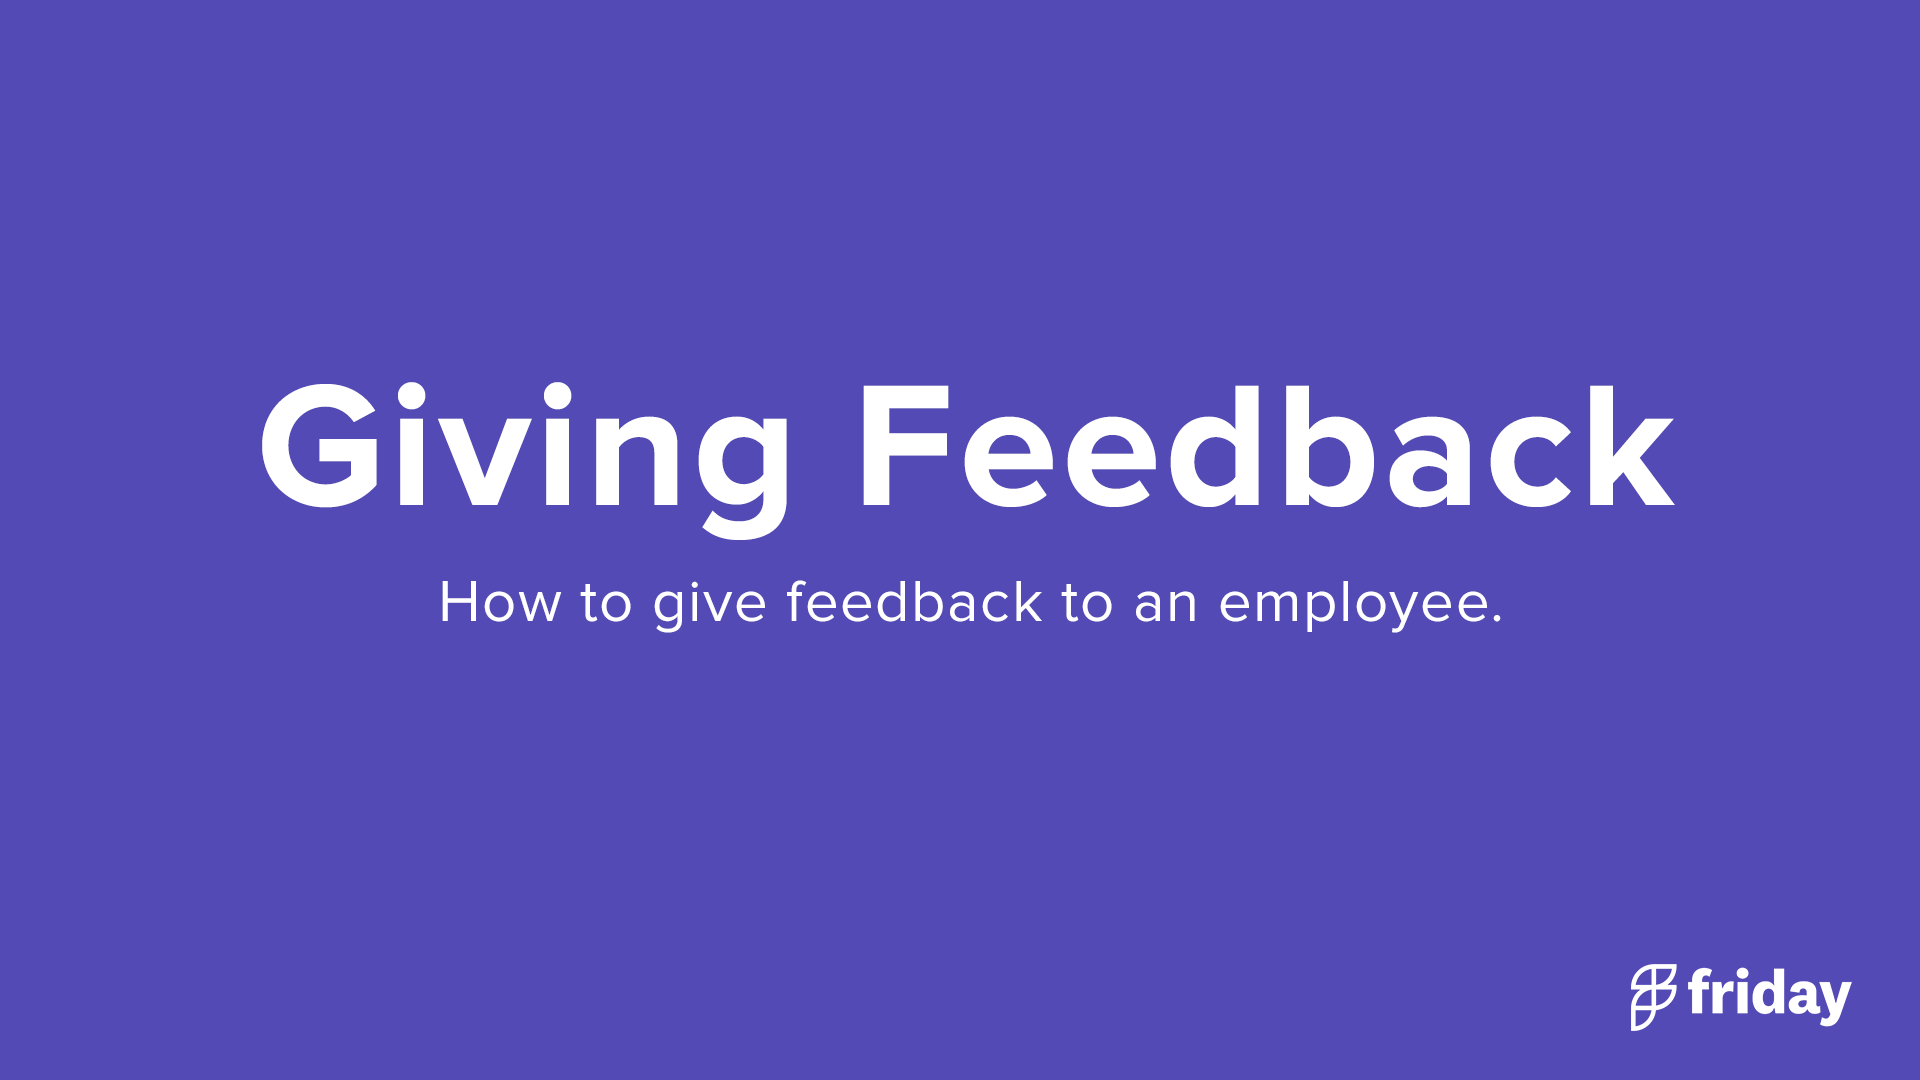 Giving Feedback to an Employee